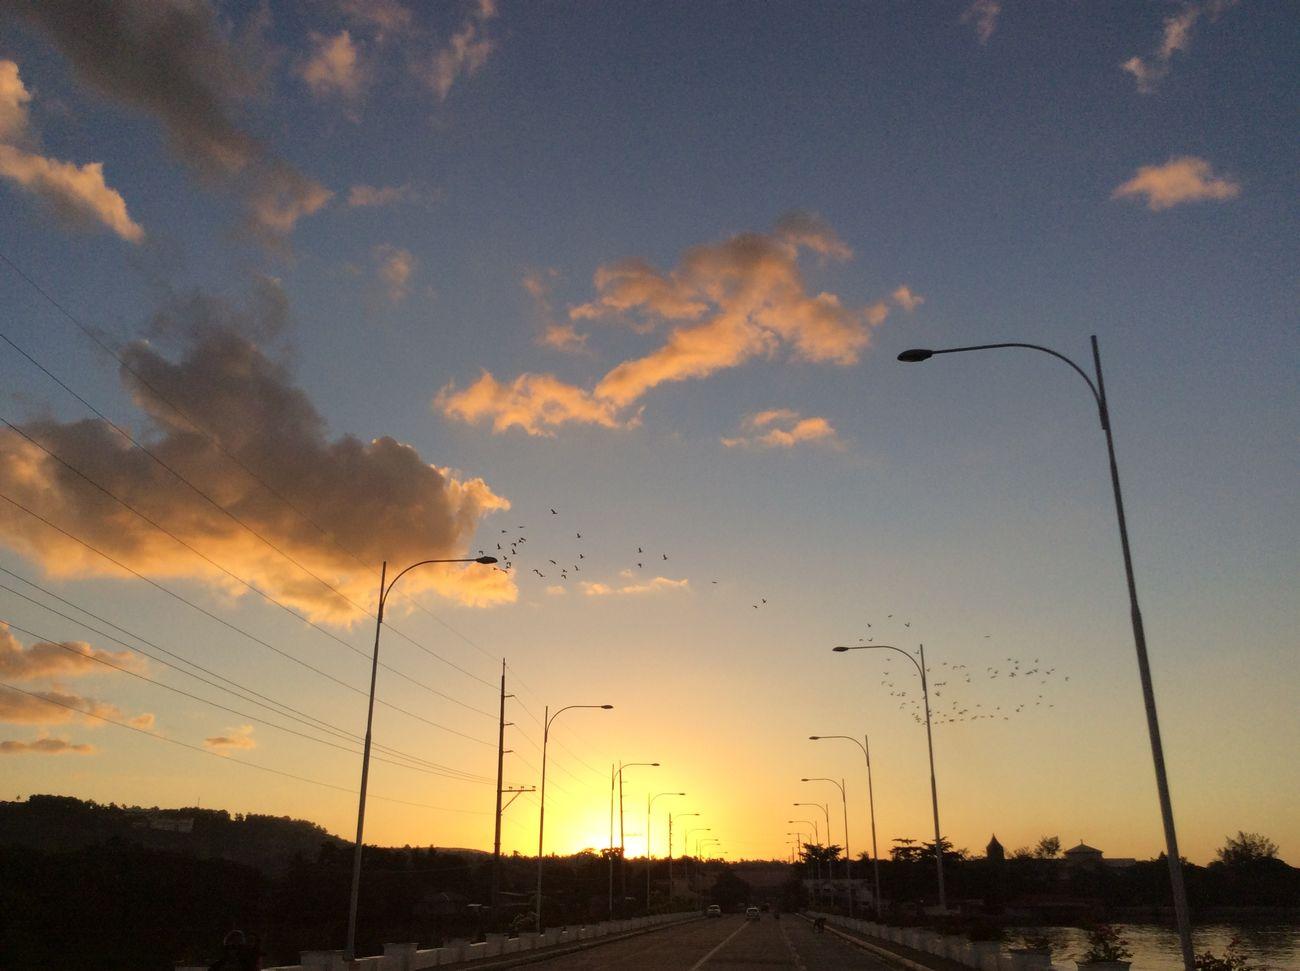 Simply love sunset